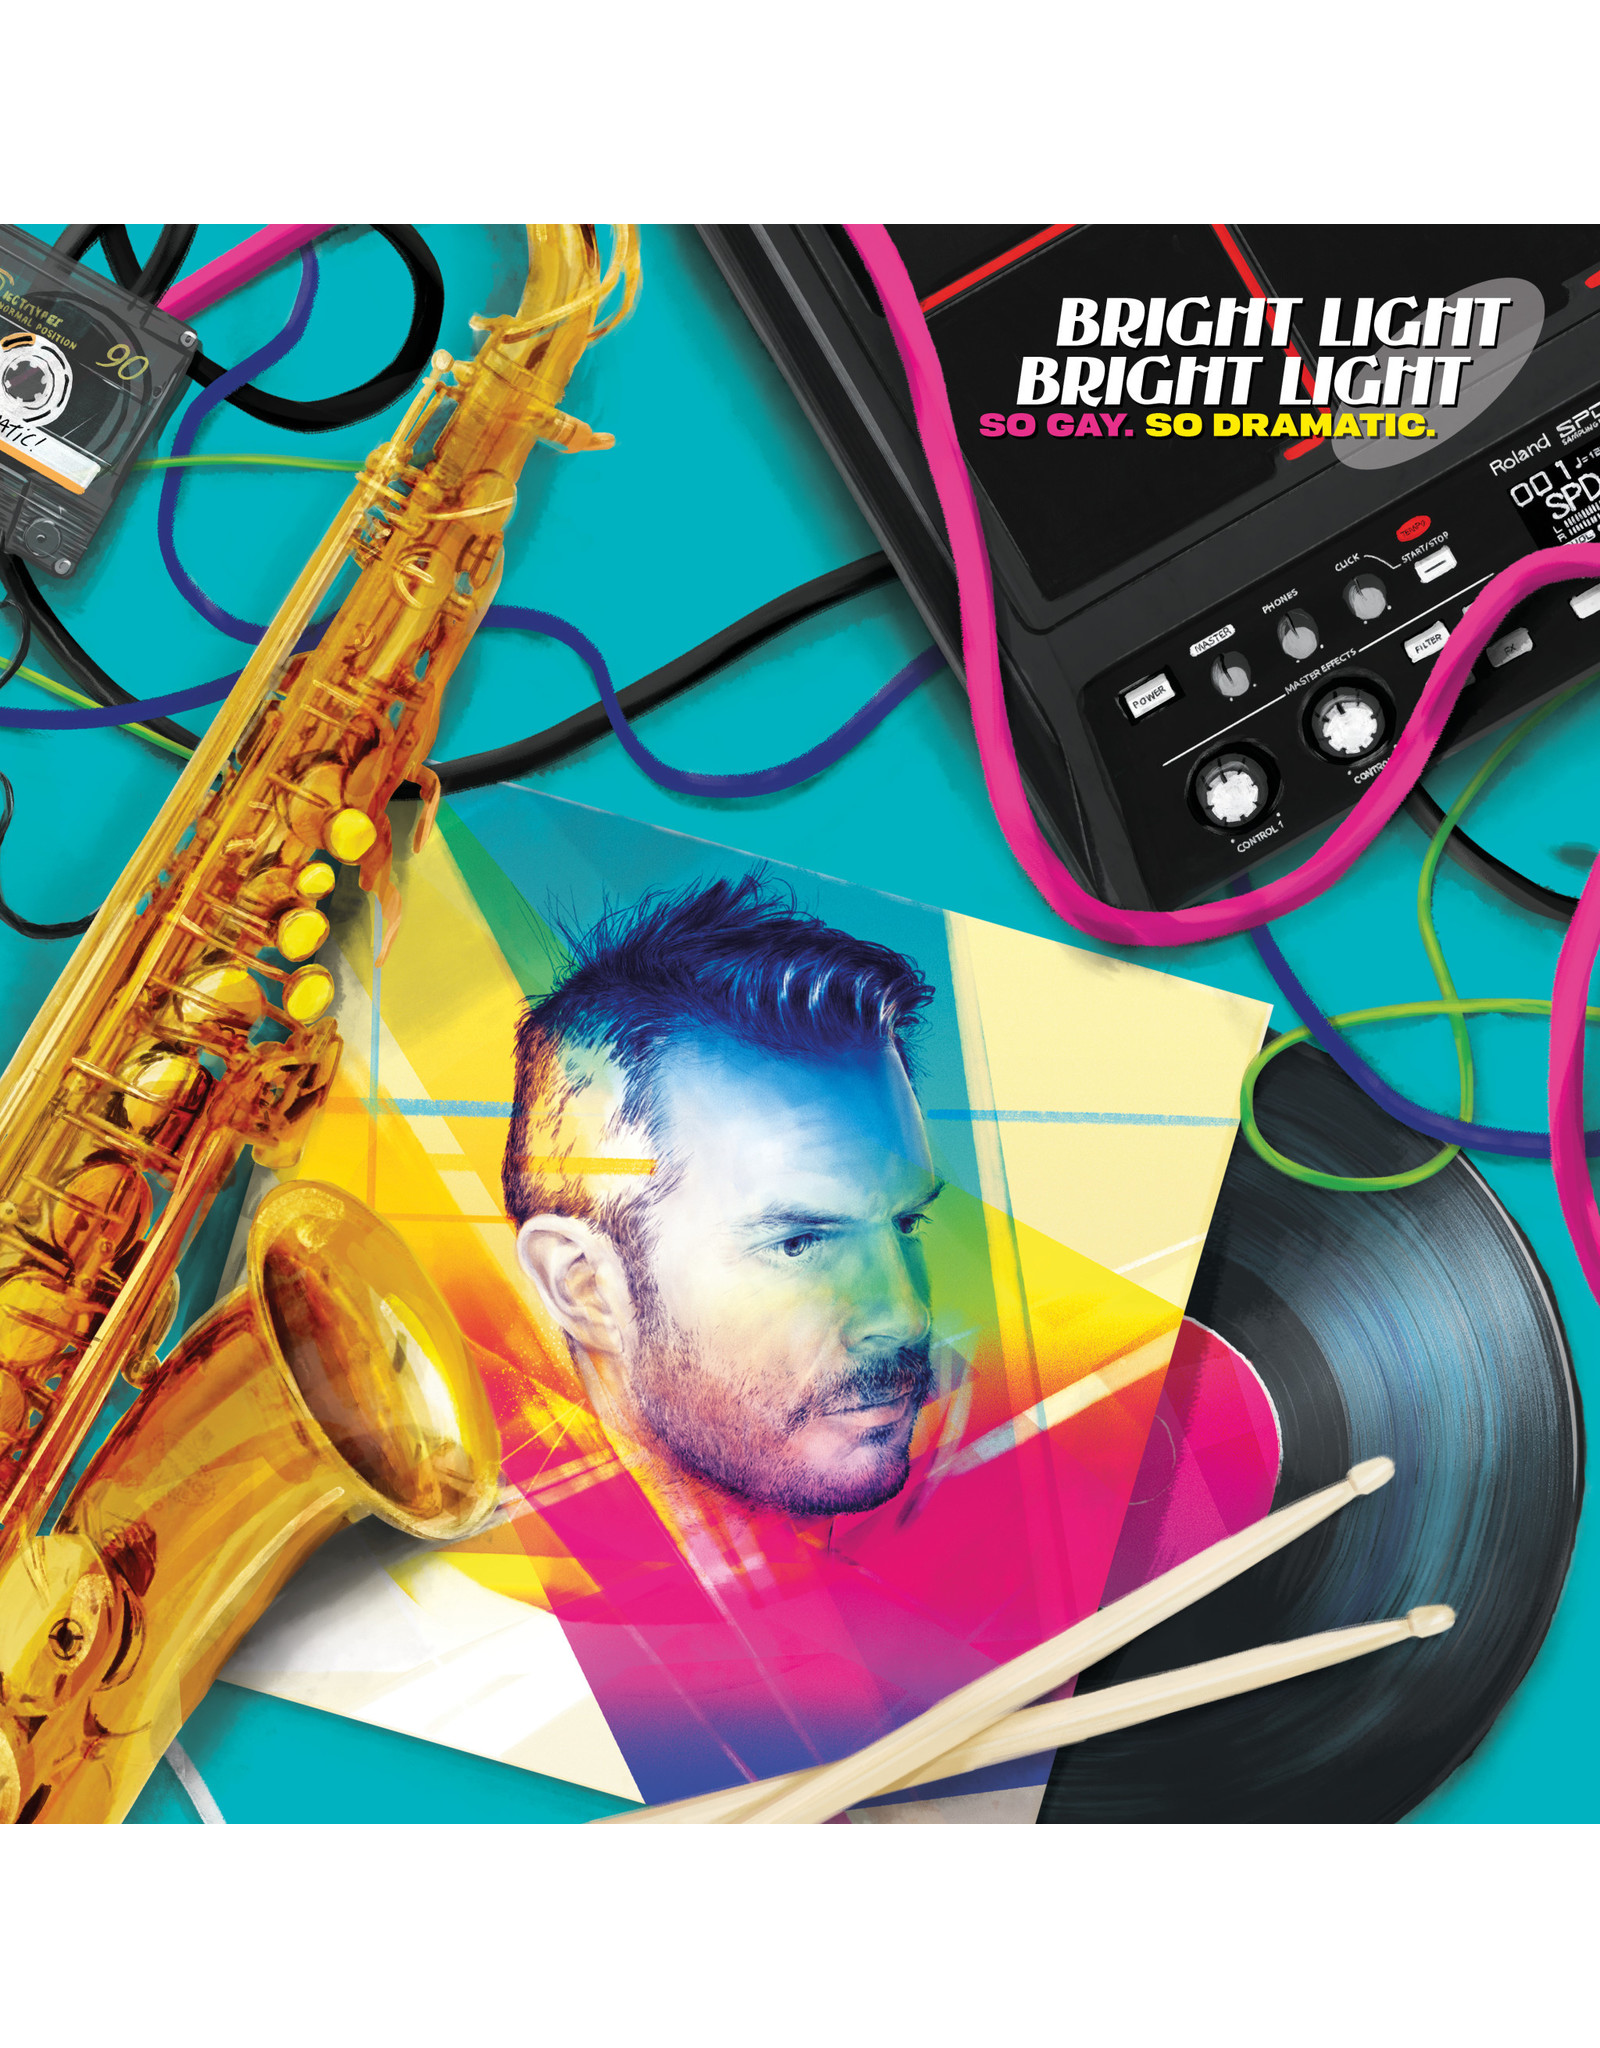 Bright Light Bright Light - So Gay, So Dramatic (Exclusive Neon Magenta / Neon Yellow Vinyl)